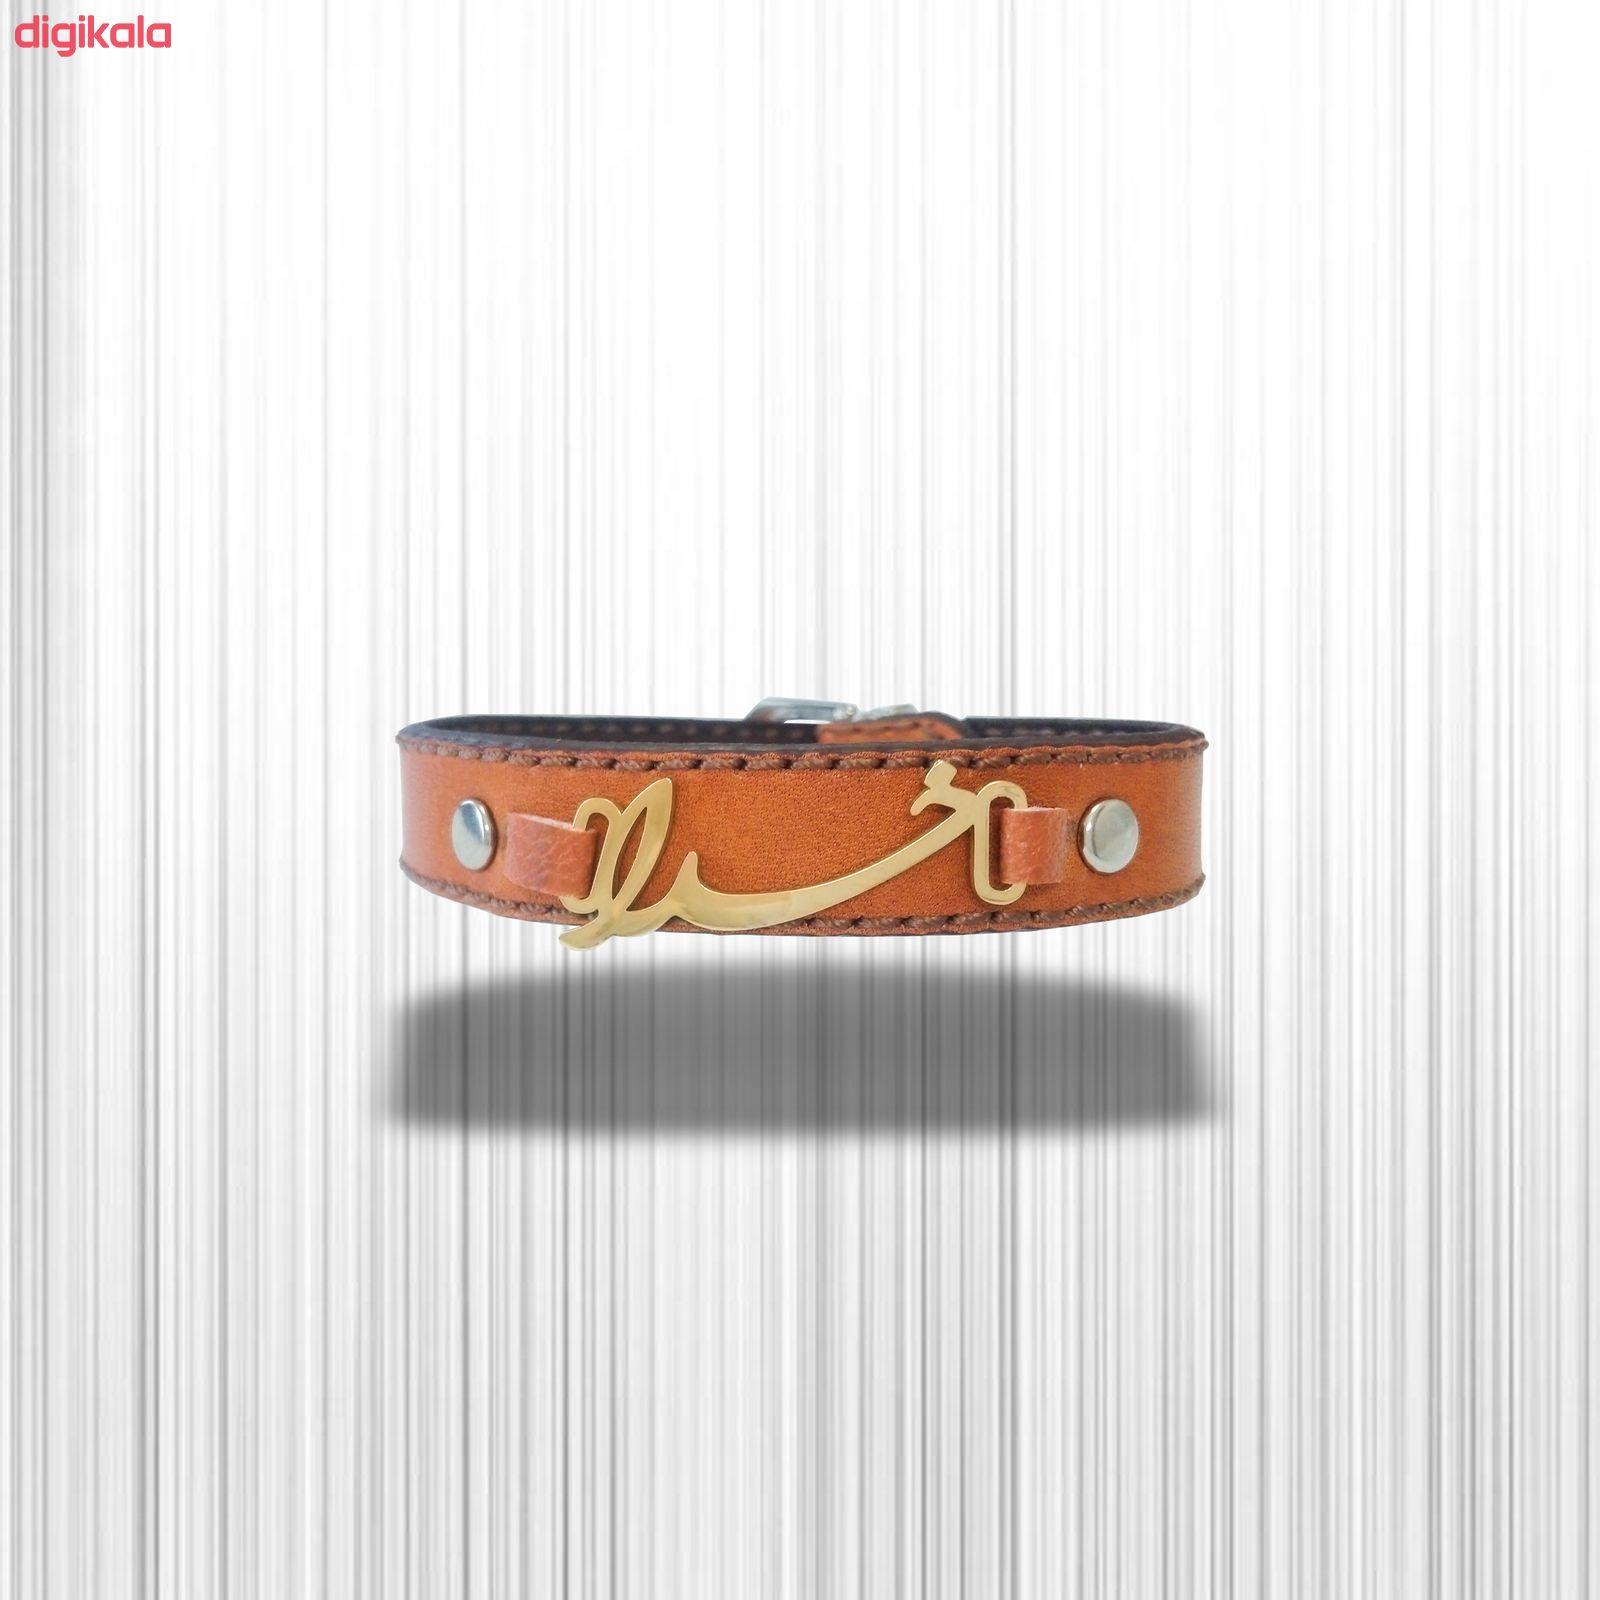 دستبند چرم وارک طرح خدا مدل پرهام کد rb50 main 1 5